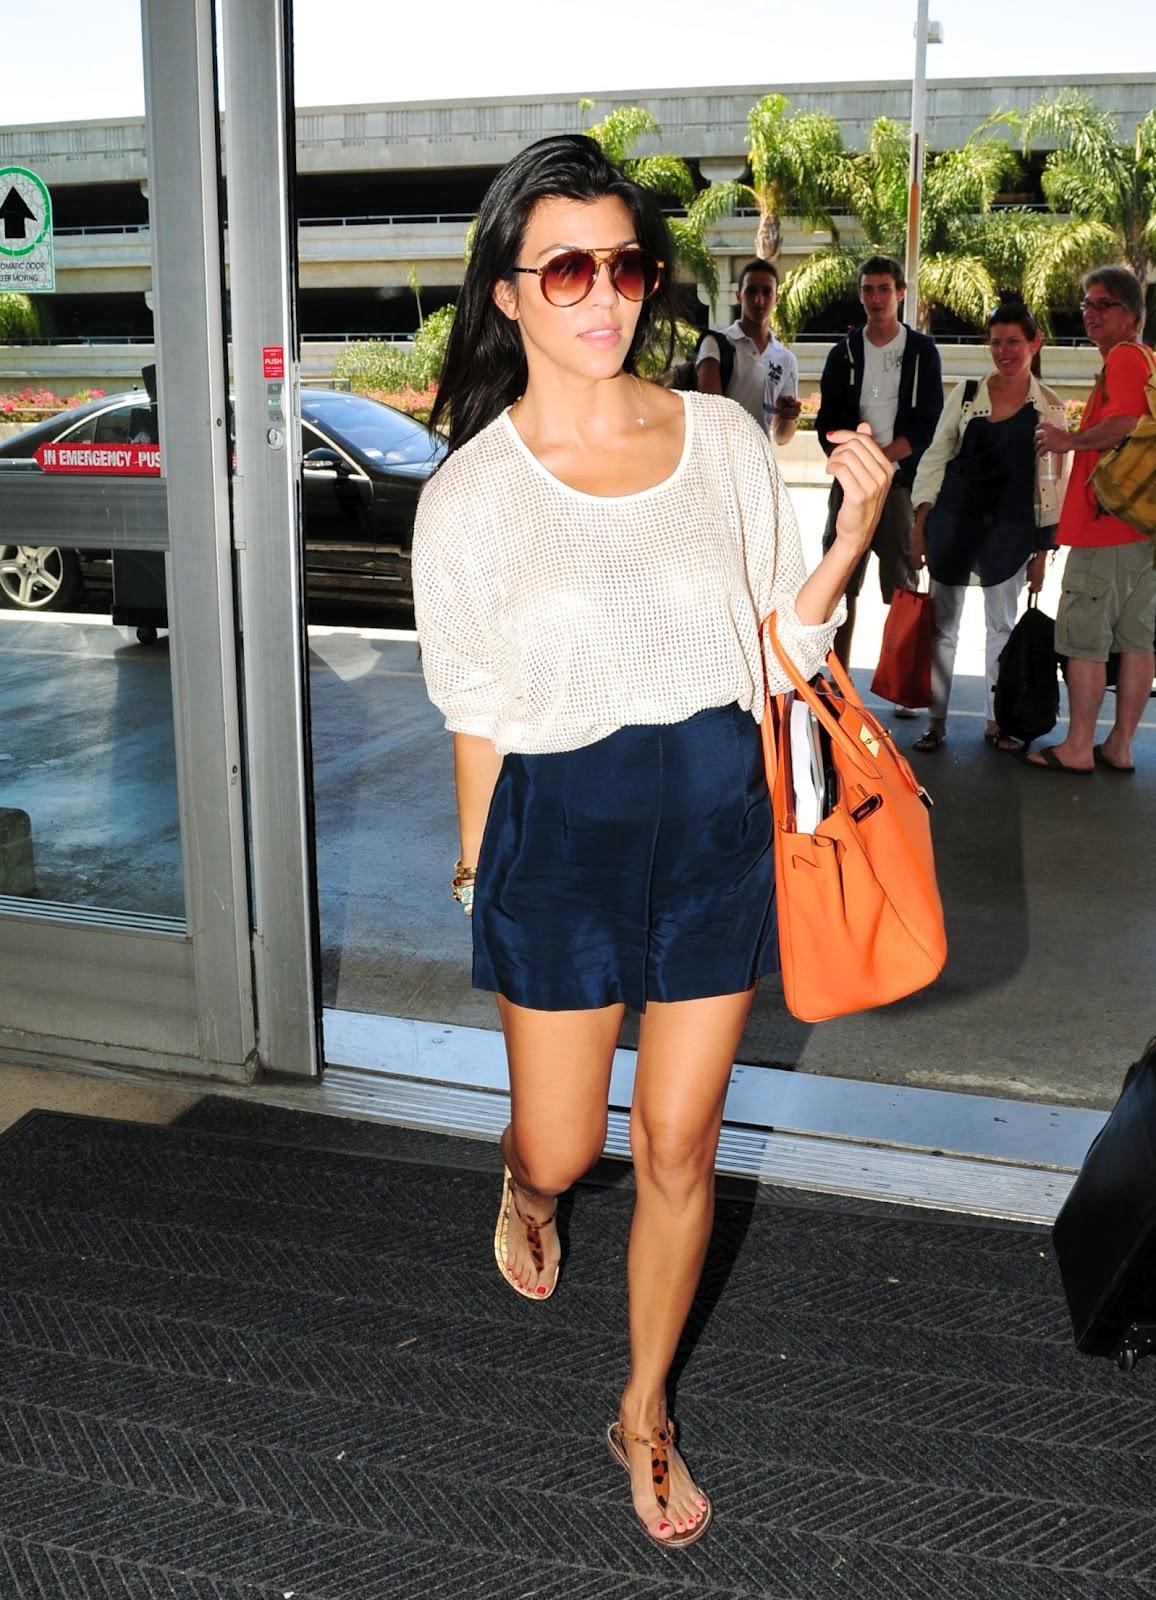 http://1.bp.blogspot.com/-CNtD-n5UPuI/T0vvovetmeI/AAAAAAAABKU/yzuE8lzgq-4/s1600/kourtney_kardashian_departs_lax_j0001_006.jpg